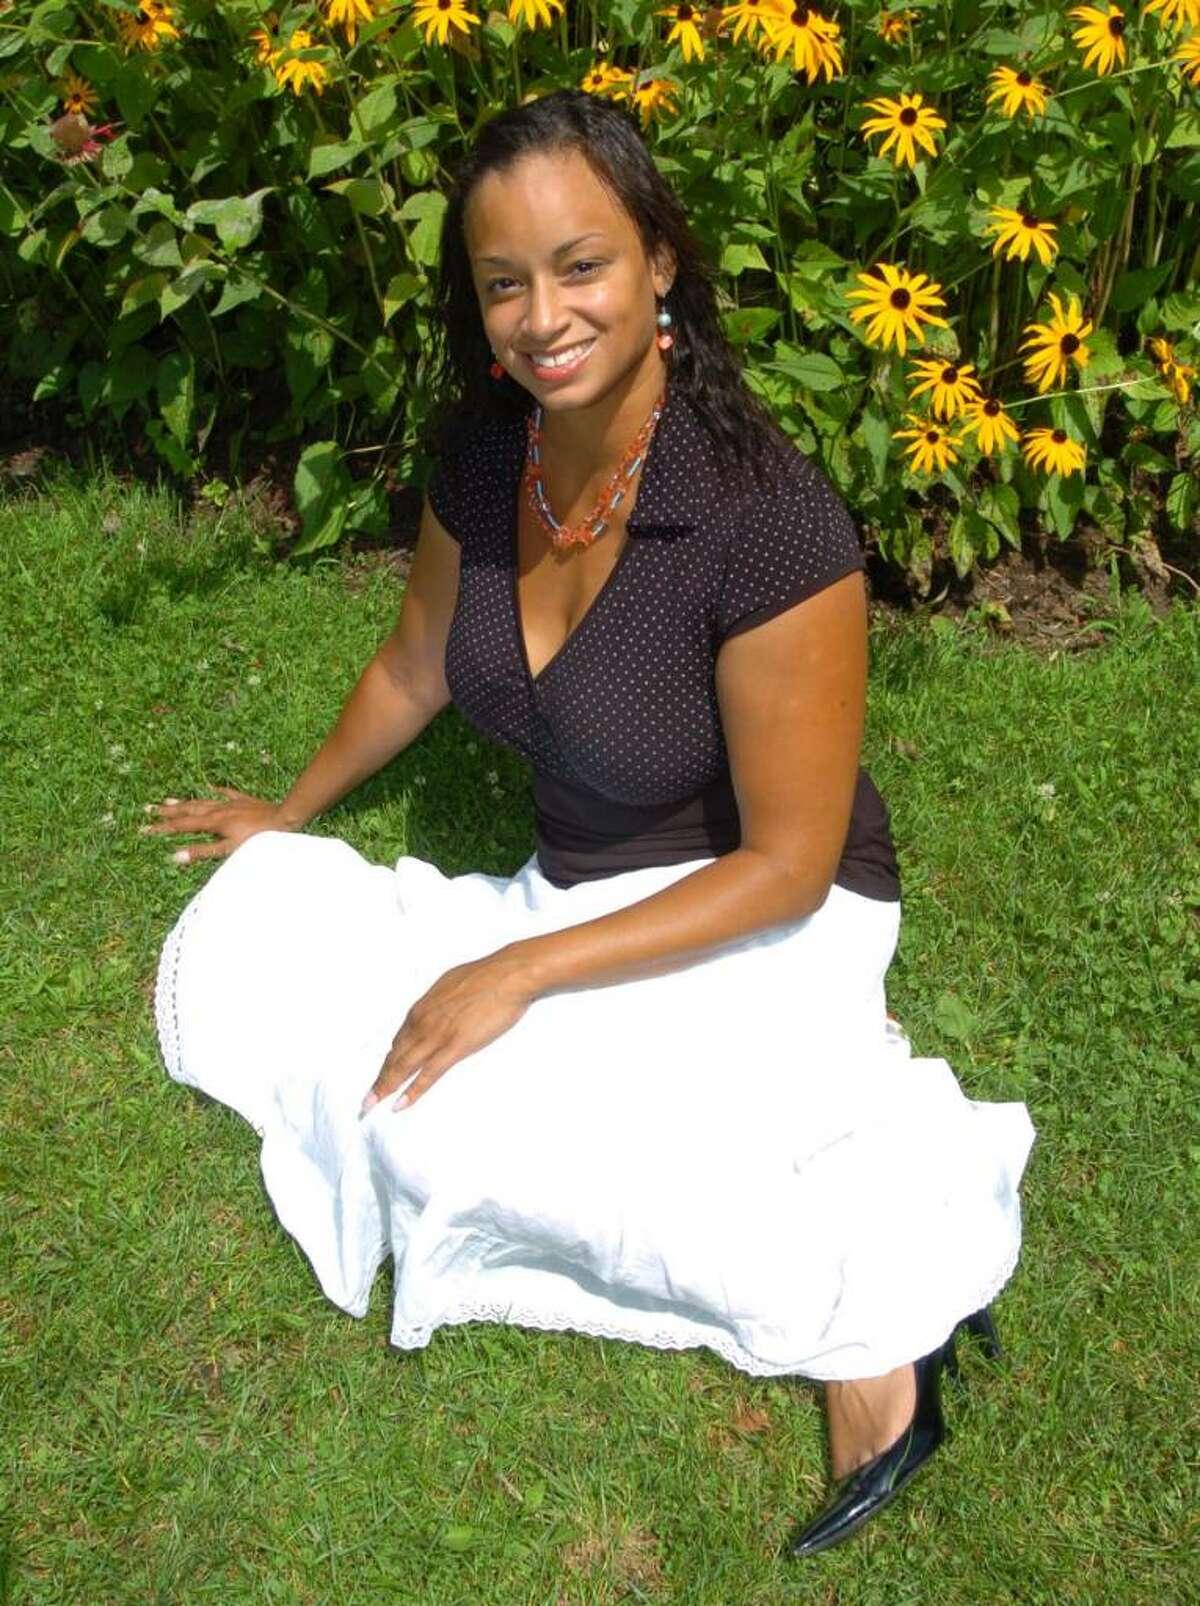 Chris Ware Staff Photographer. Shirley Ricart, executive director of WeCAHR in Danbury, CT taken August 6, 2009.